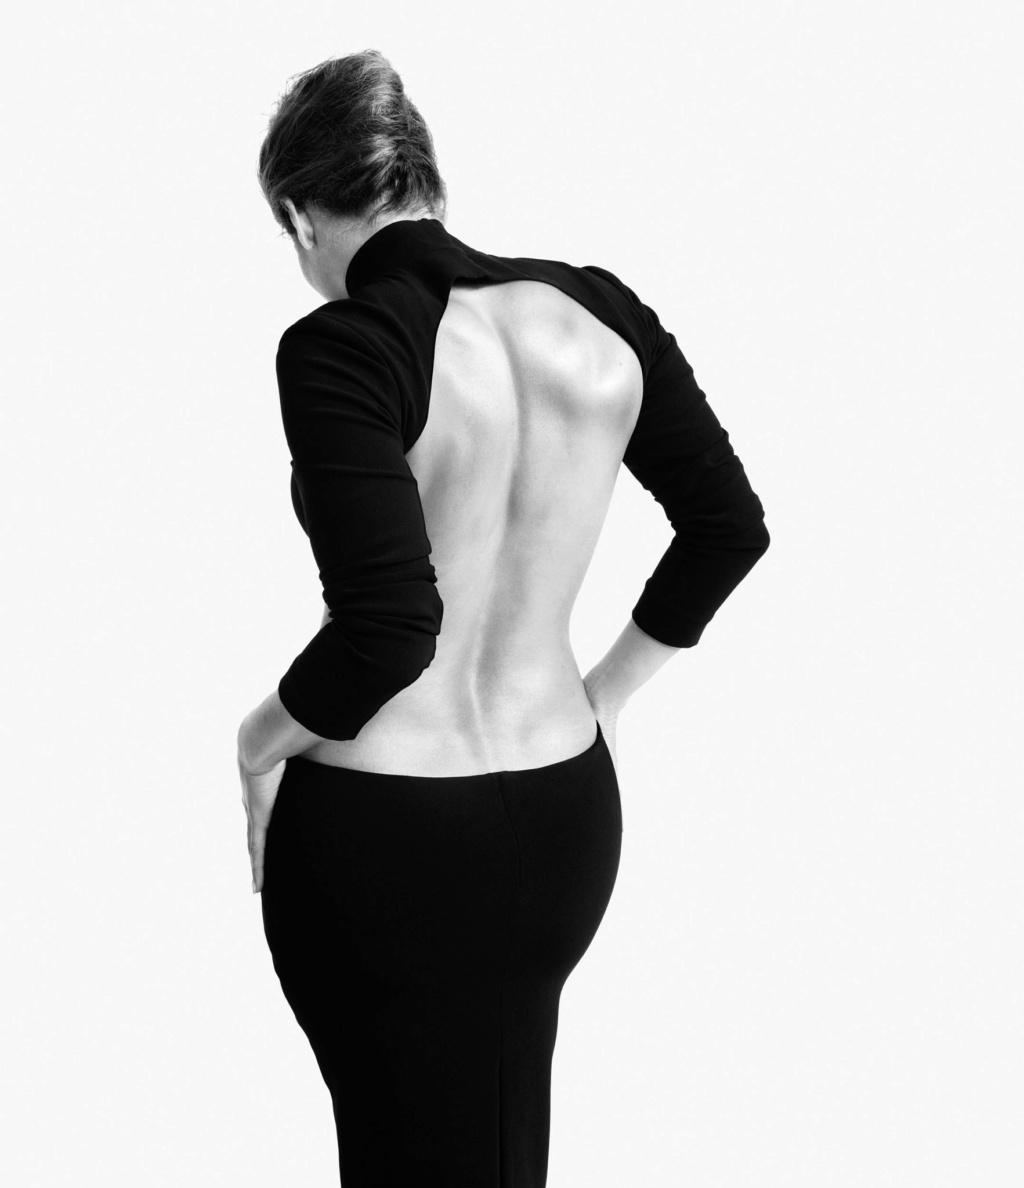 amas - Jennifer Lopez - Σελίδα 50 E76d0b10